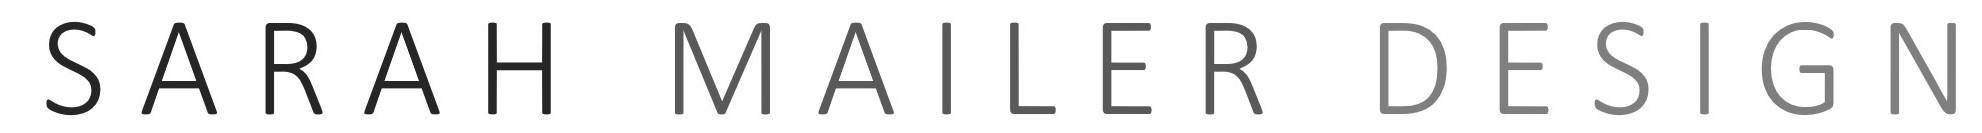 Sarah Mailer Deisgn LogoLong